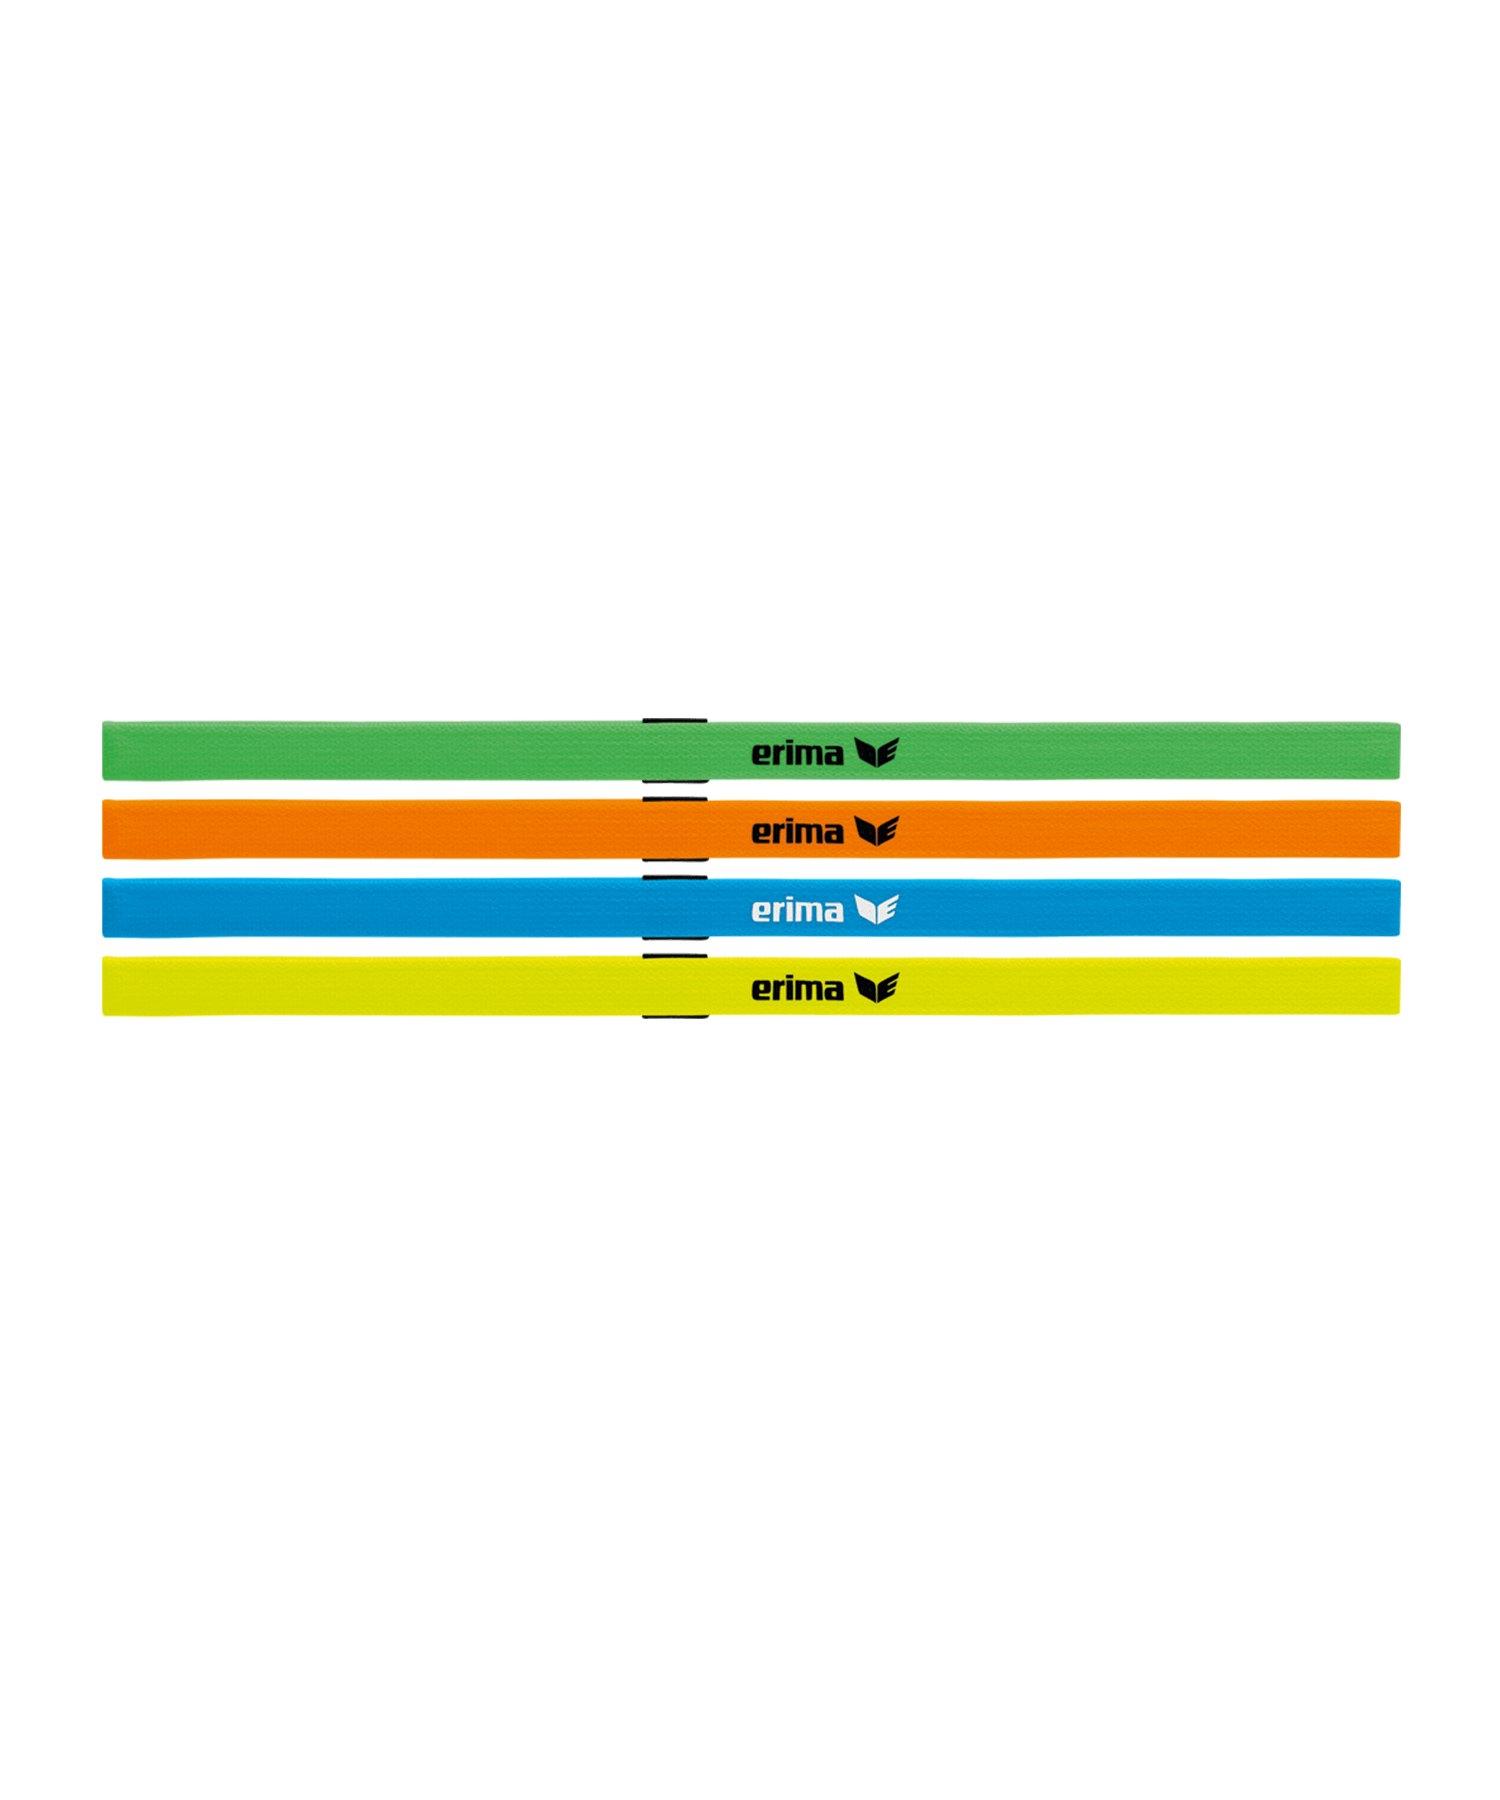 Erima Haarband Black Series 4er Set Bunt - gruen